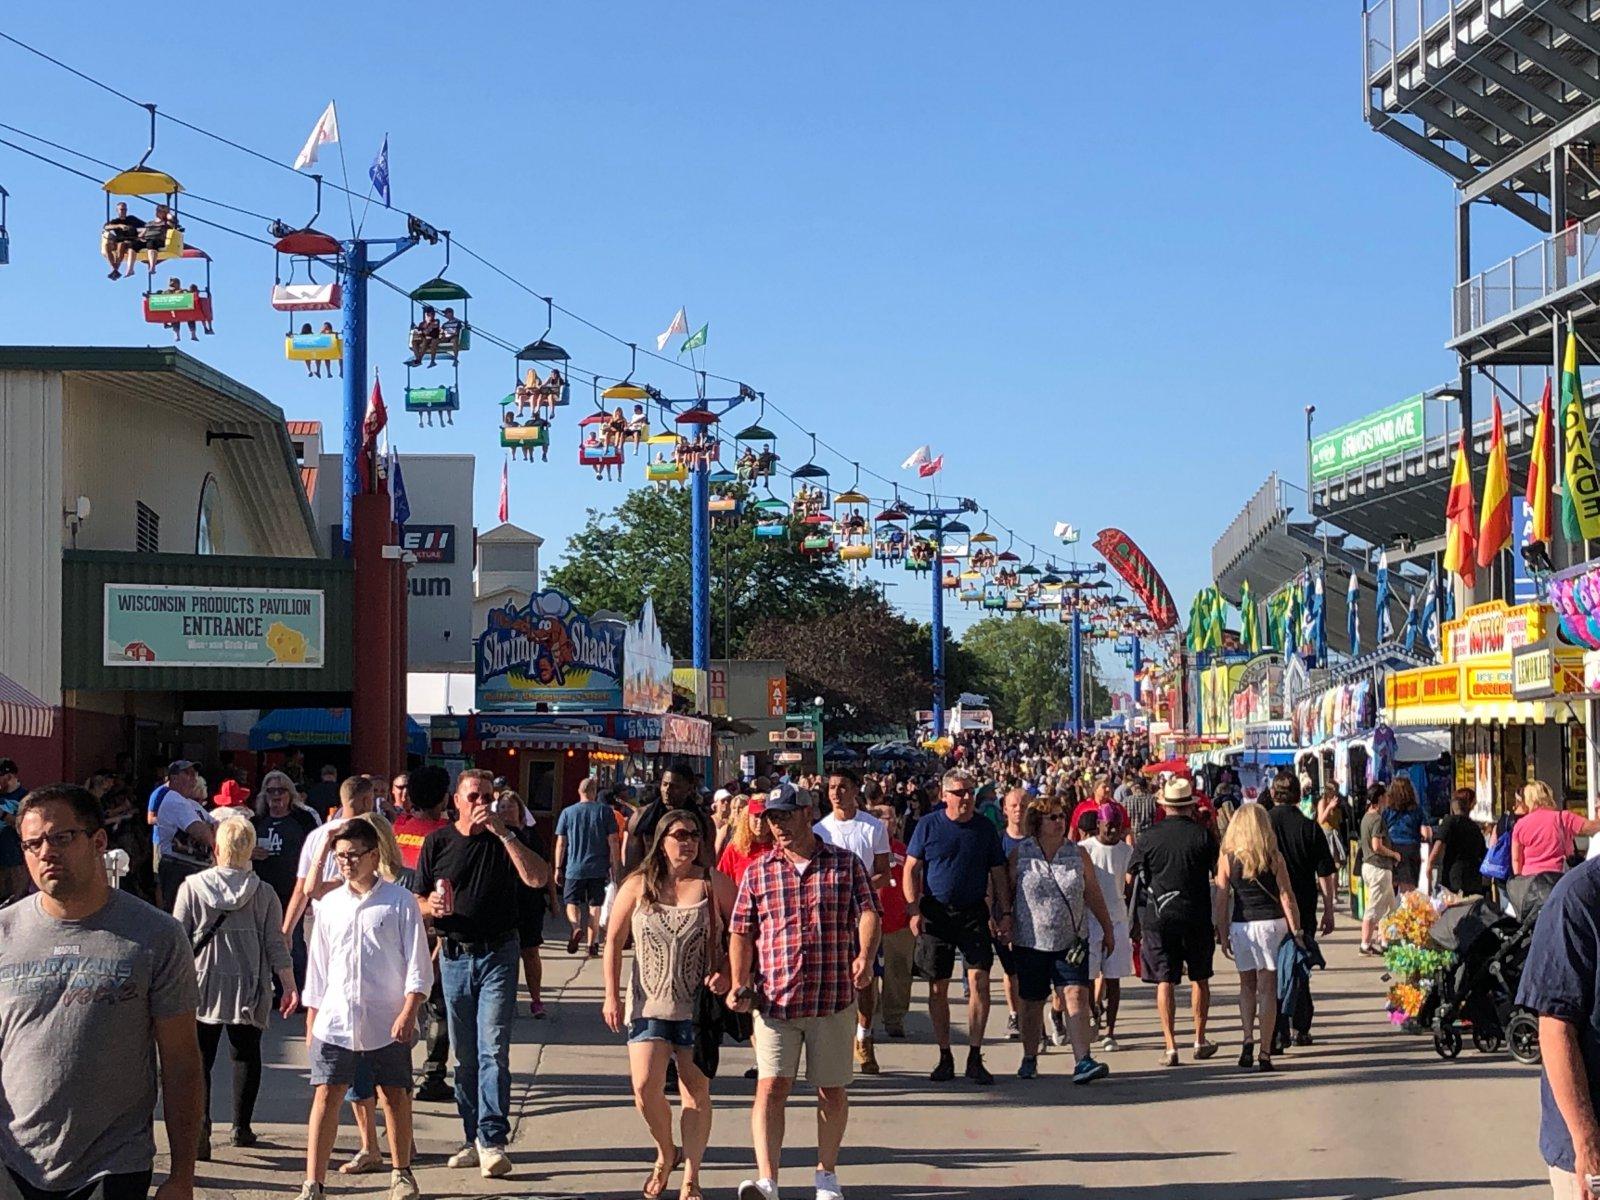 Wisconsin State Fair. Photo taken August 1, 2019 by Jeramey Jannene.